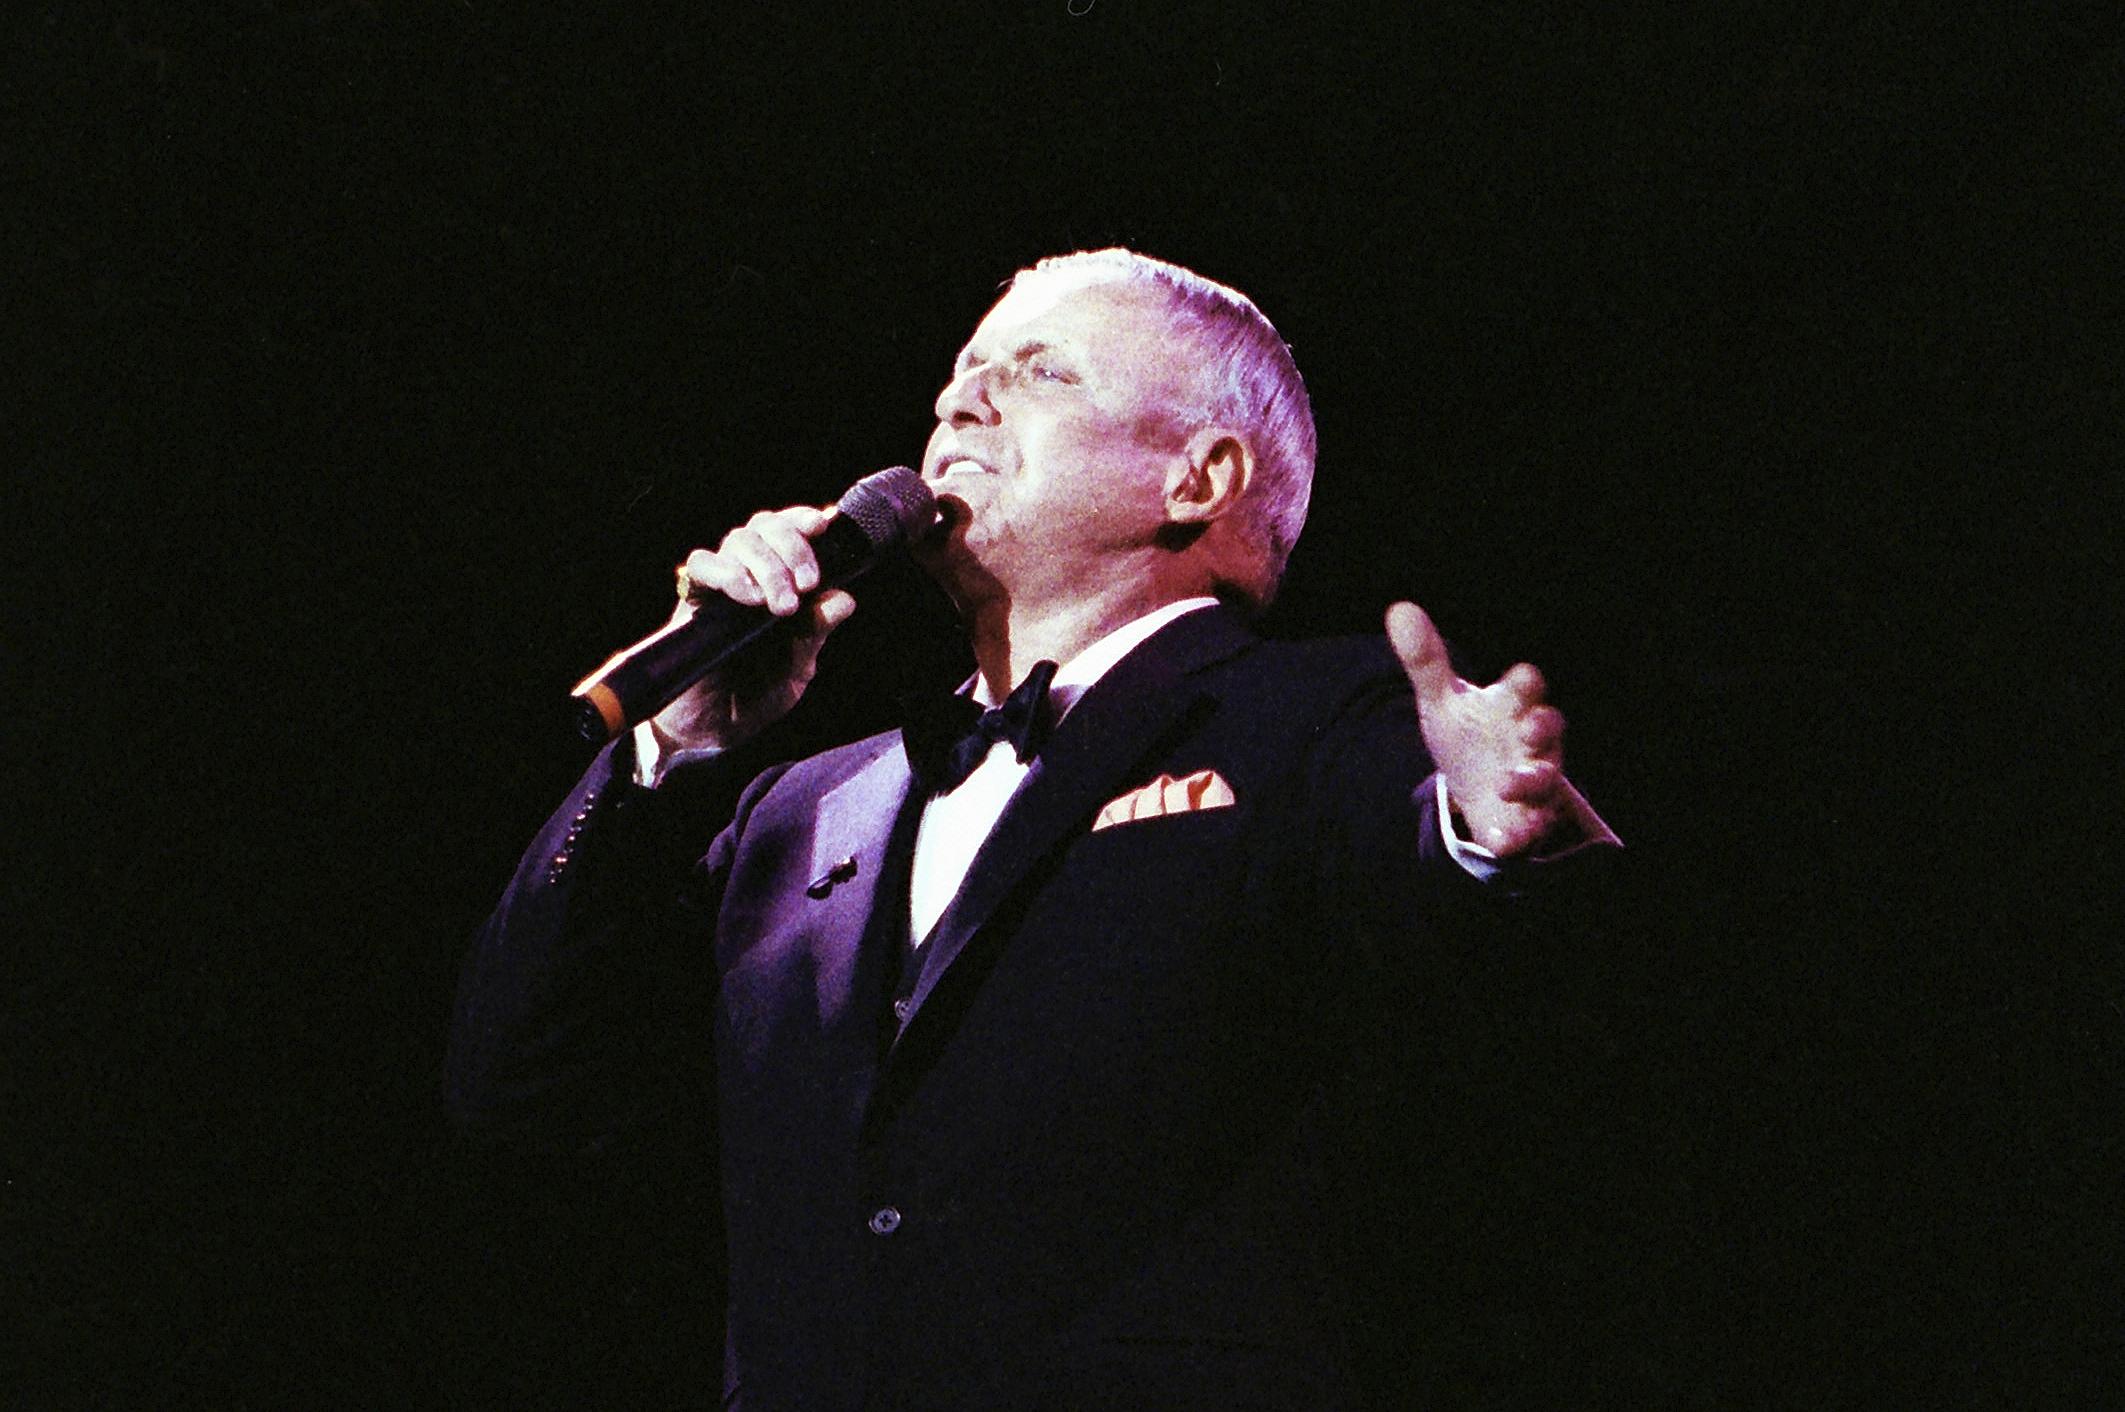 Singer Frank Sinatra performs at the Royal Albert Hall in London, Britain May 26, 1992. REUTERS/Dylan Martinez